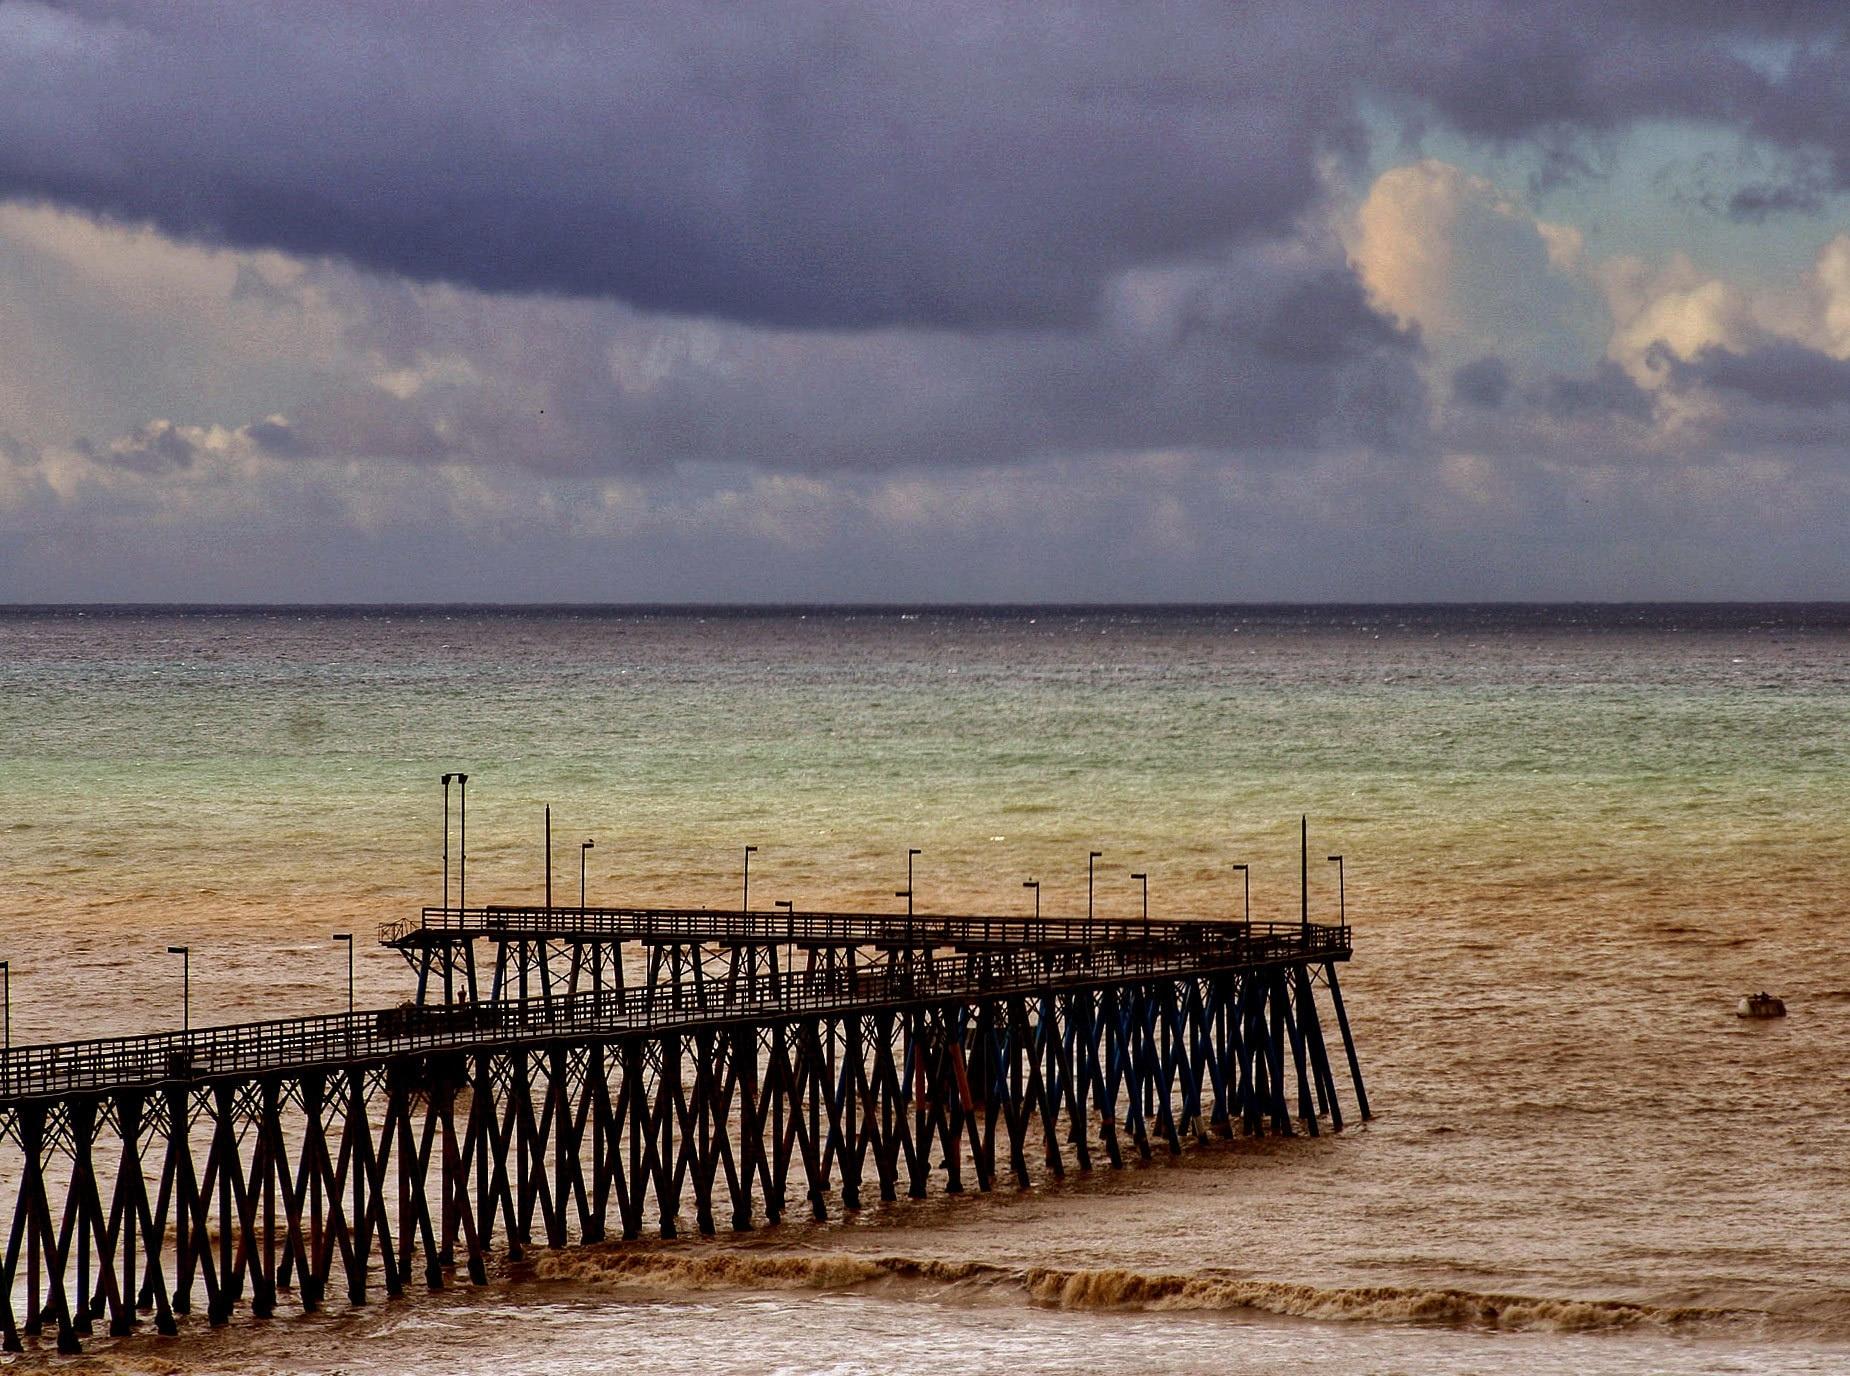 Rosarito Shores, Playas de Rosarito, Baja California, Mexico